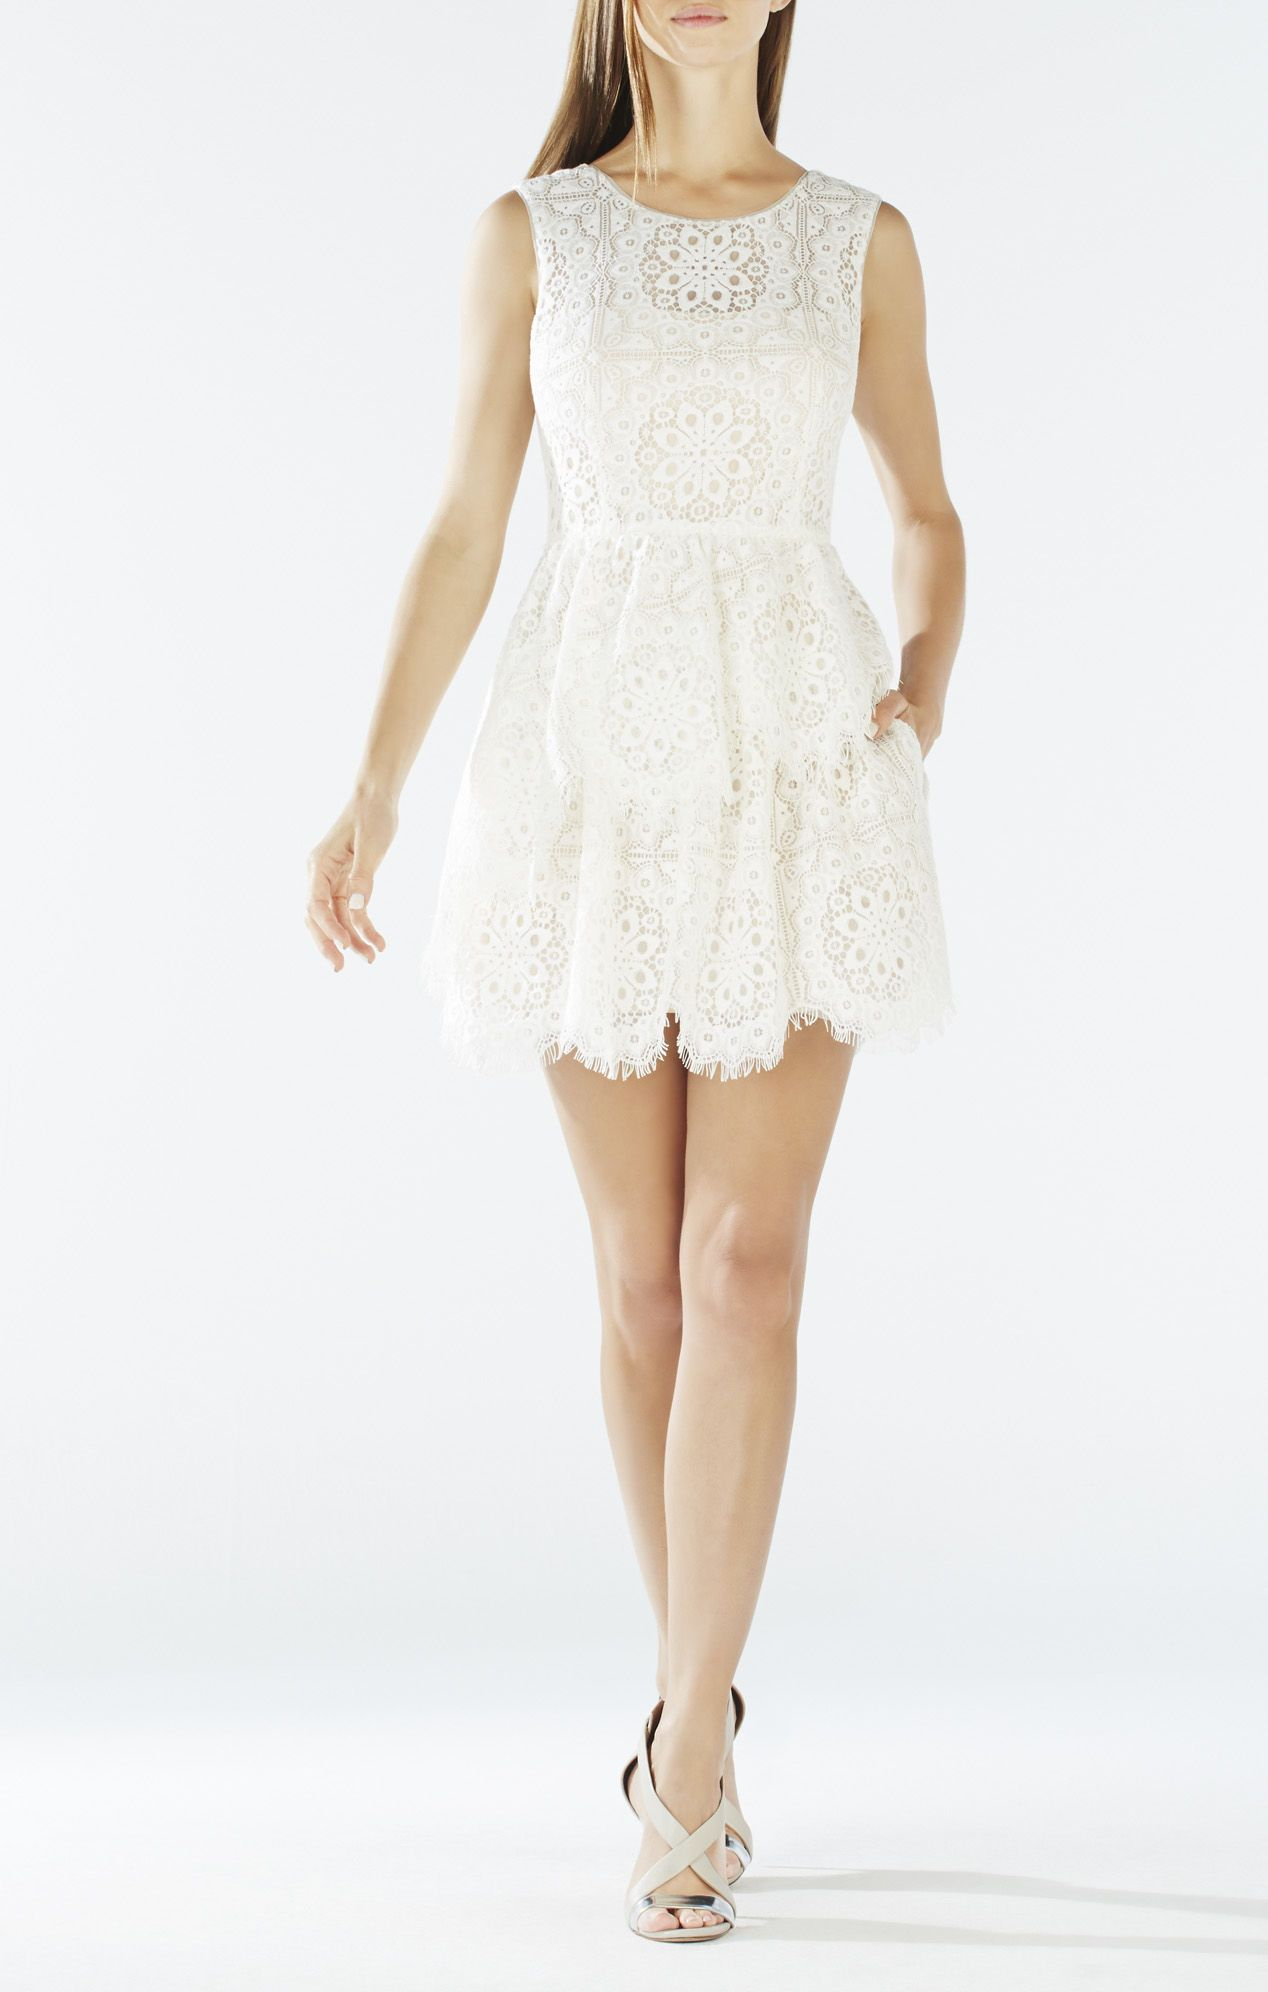 Dresses - Cocktail Dresses, Prom Dresses, and Bridesmaid Dresses ...